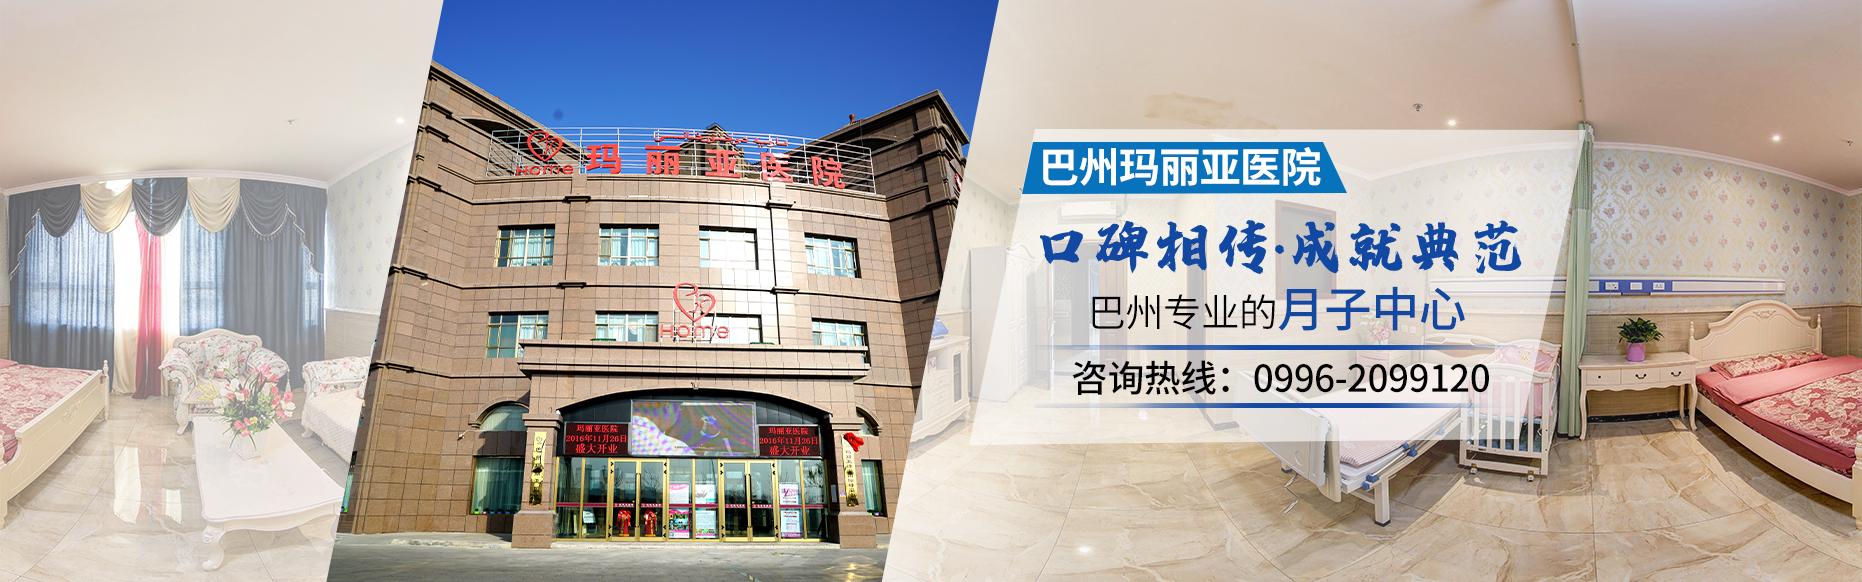 http://bazhoumly.com/data/upload/202101/20210104163225_633.jpg